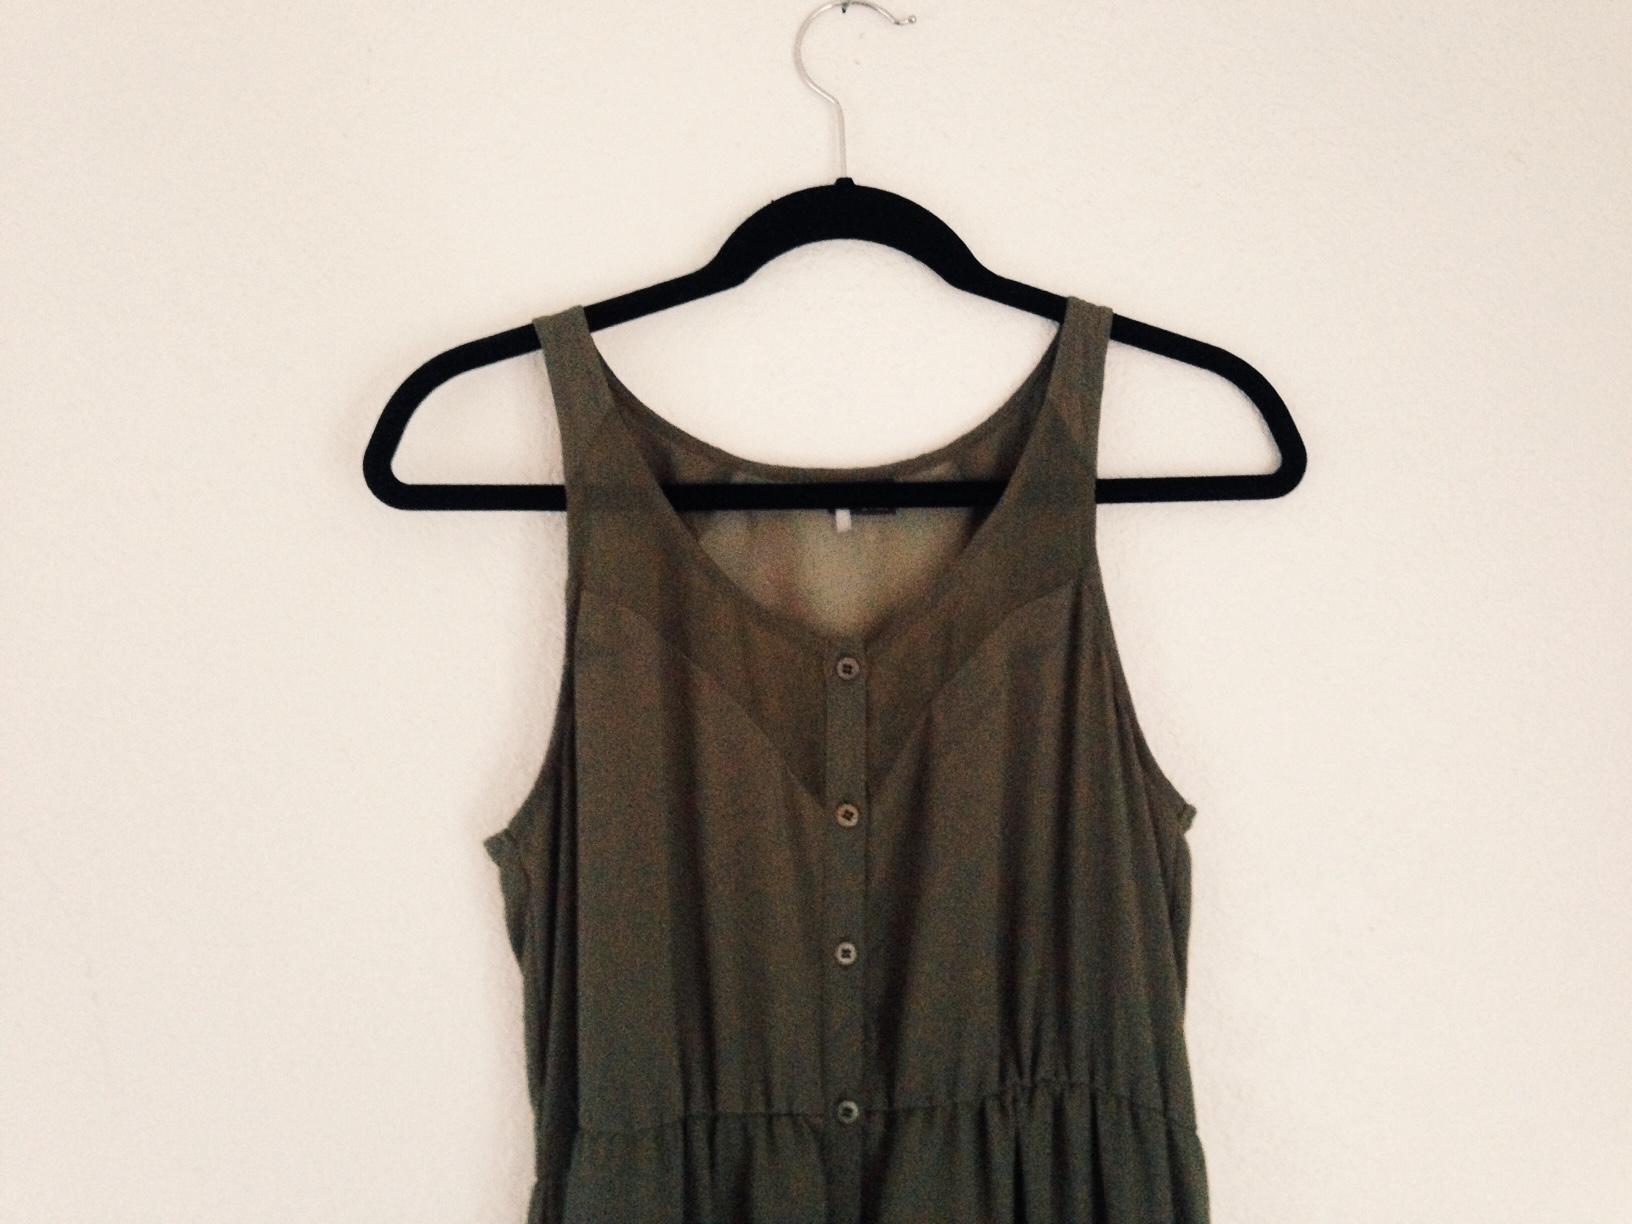 7d5e6304bb808 Olive green Maxi dress by H M · Lady Fox Stuff · Online Store ...